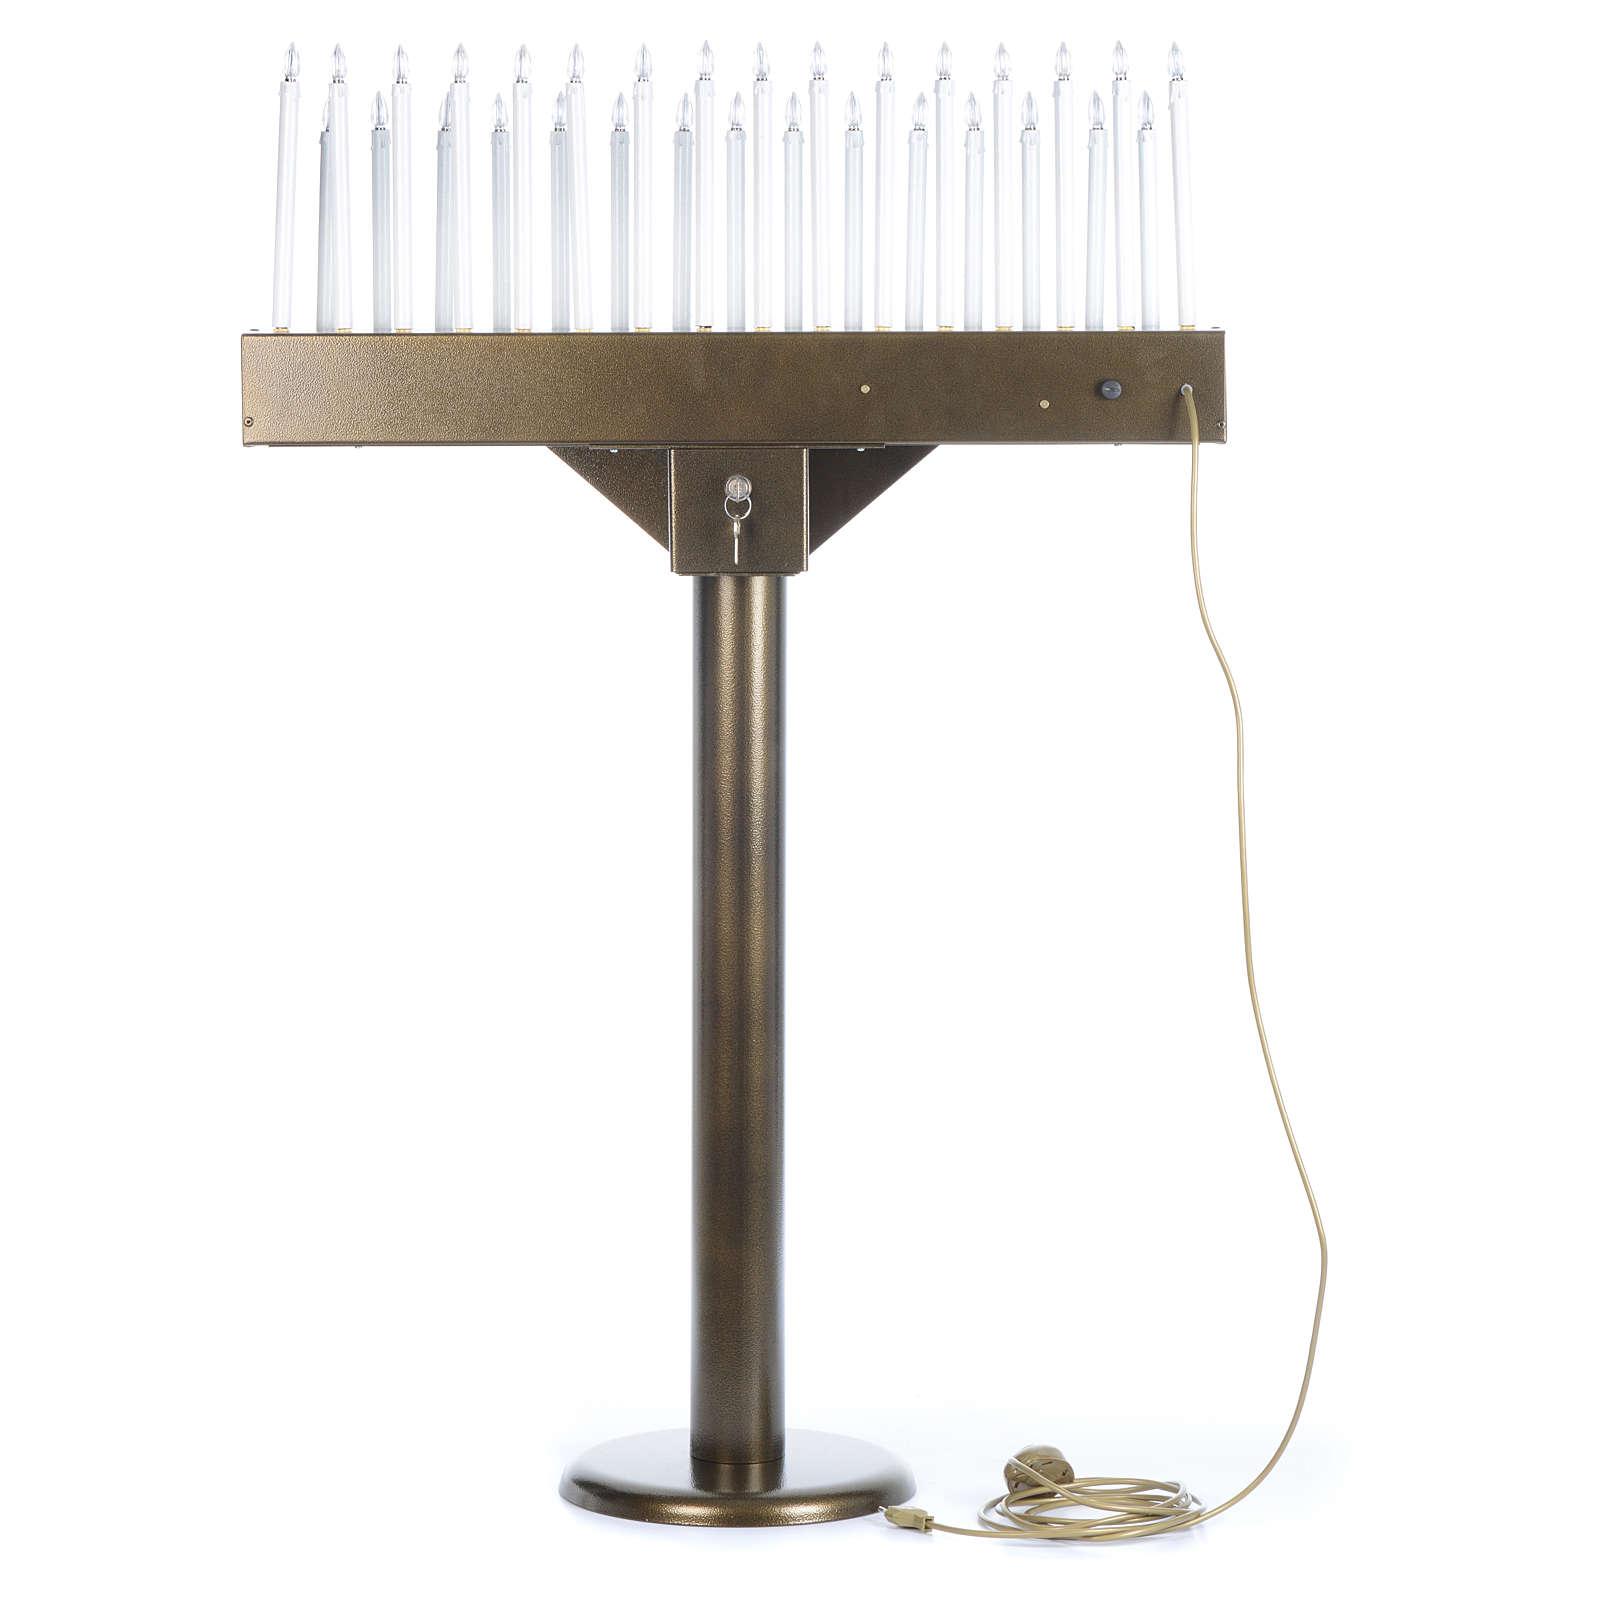 Lampadario electónico para ofrendas 31 velas, lámparas con botones 12 V 4